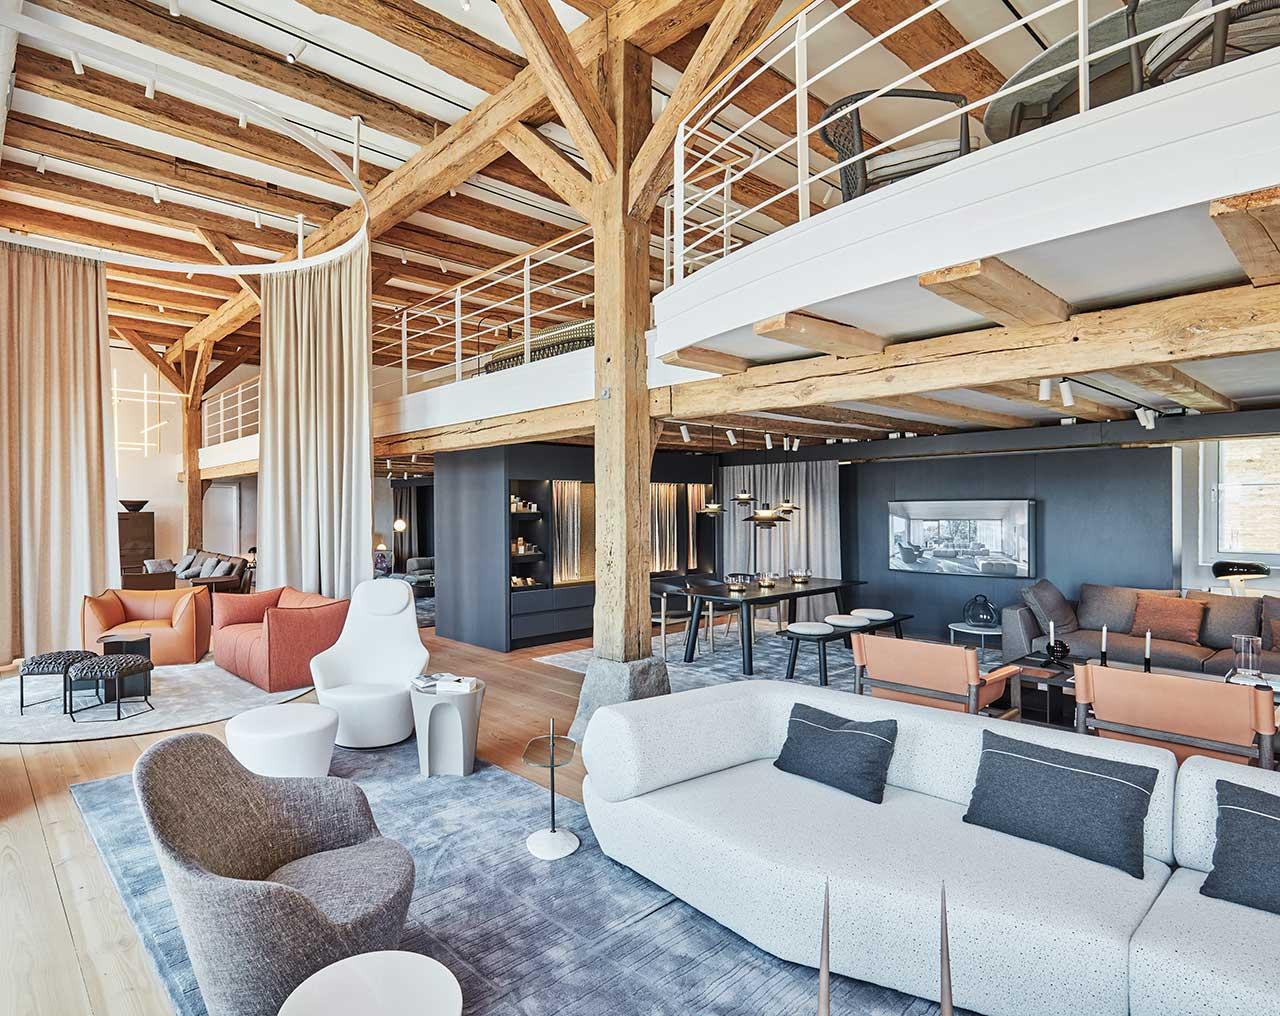 D Studio: A New Modern Design Destination Opens in Copenhagen